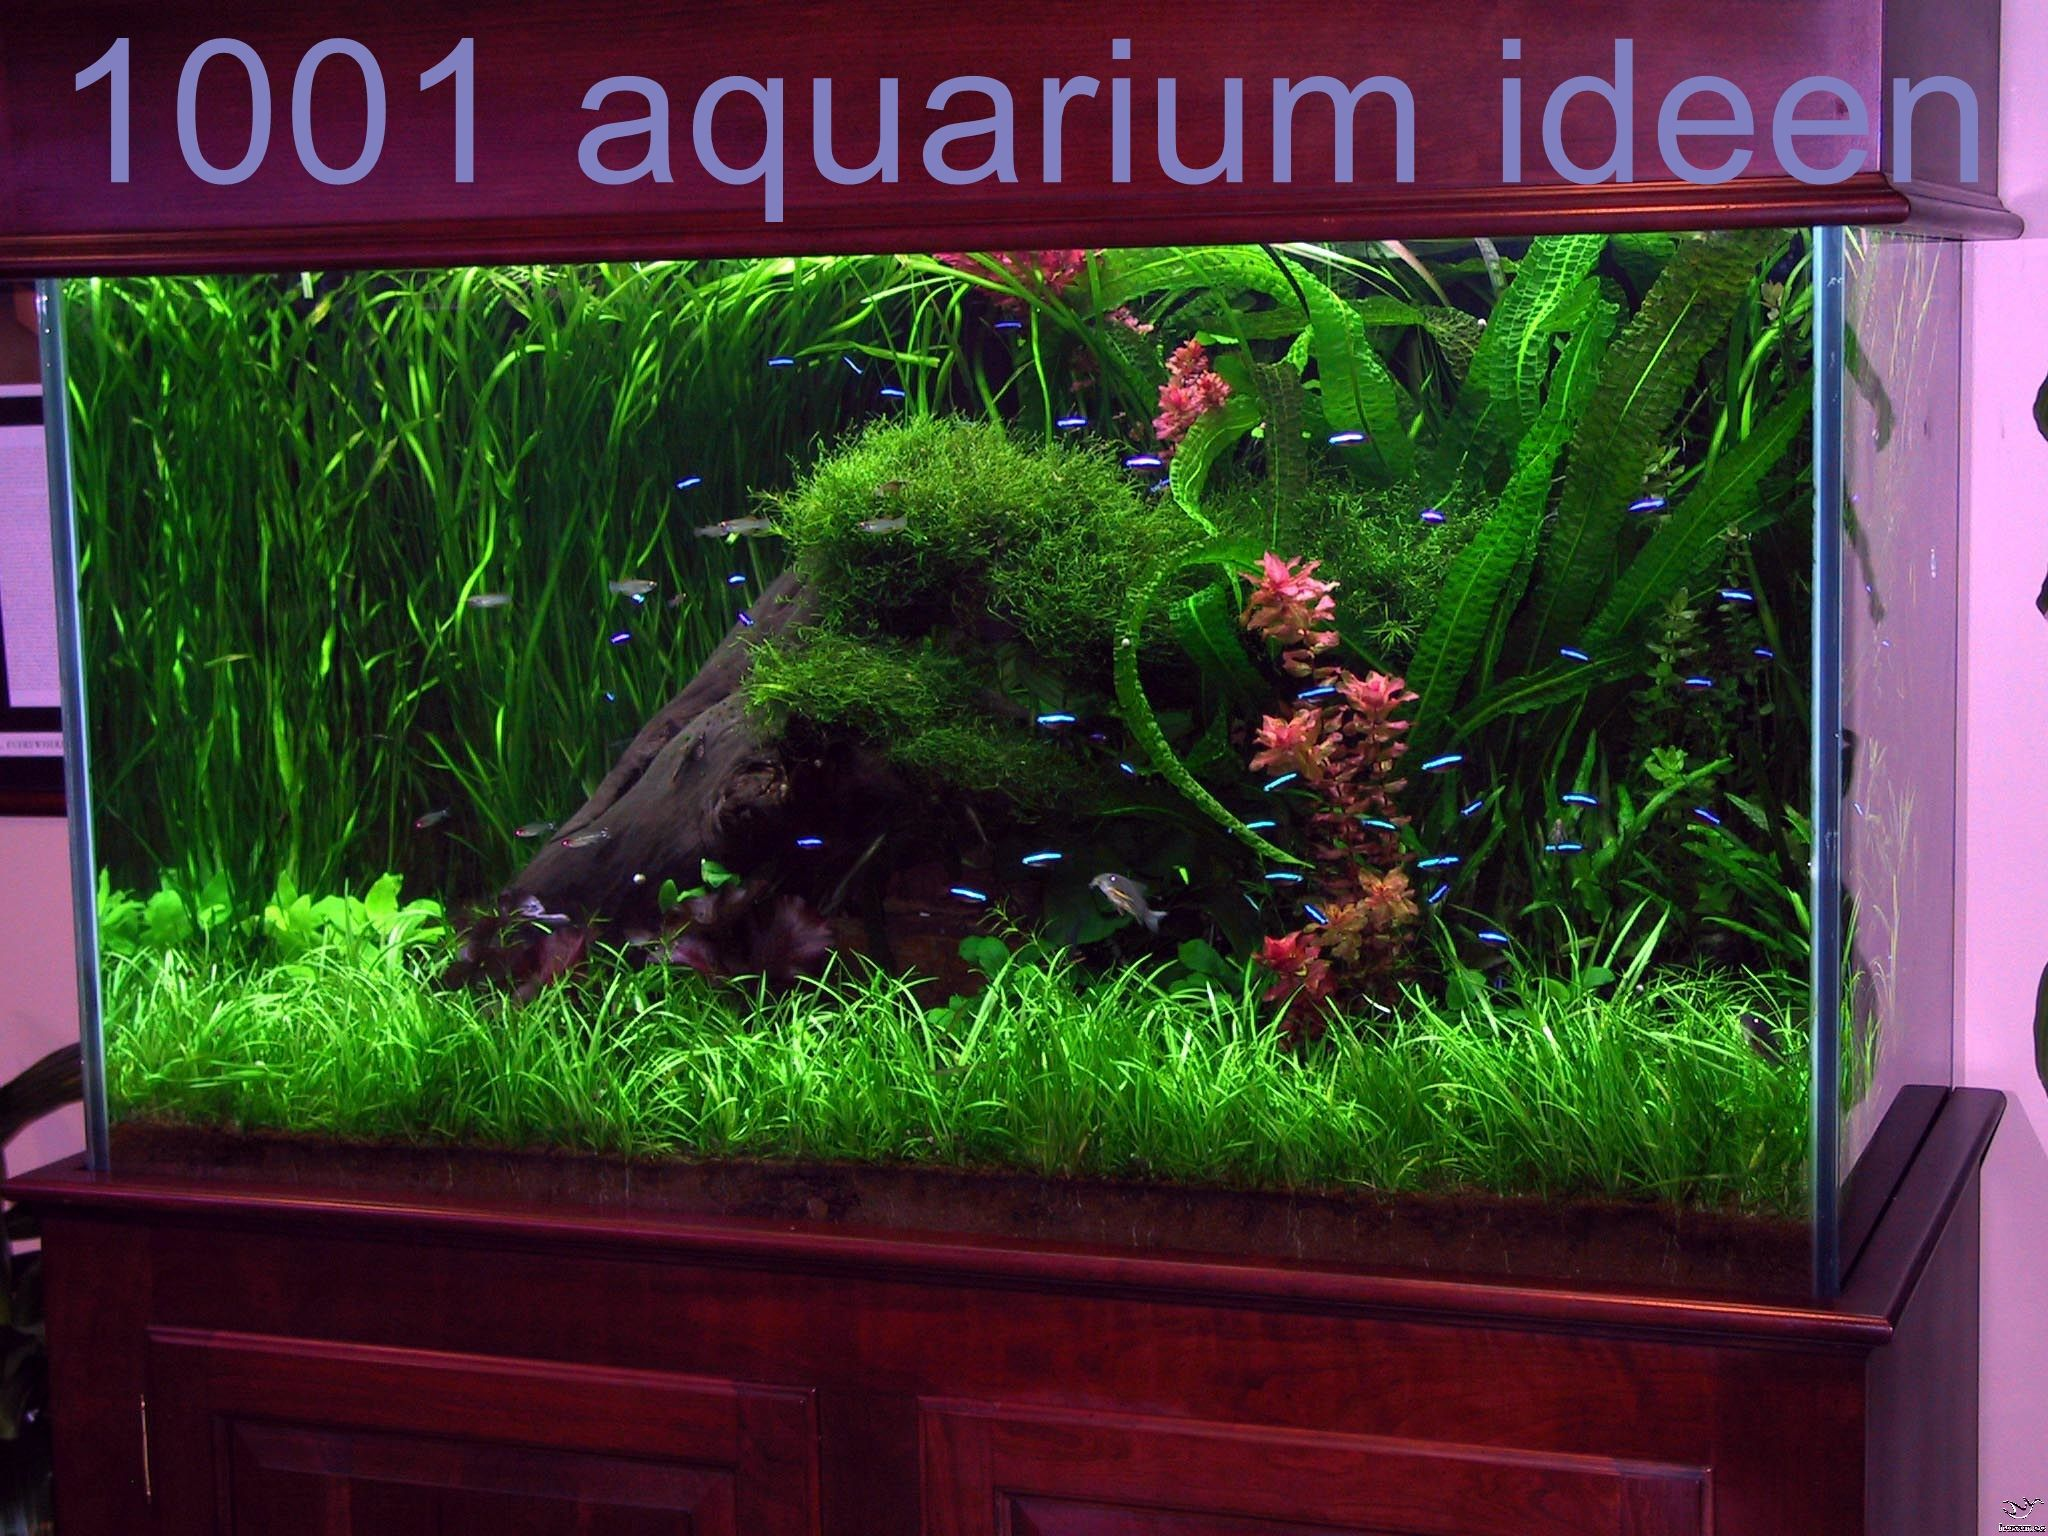 Aquarium Ideen Bilder In 2020 Fresh Water Fish Tank Fish Tank Decorations Fish Tank